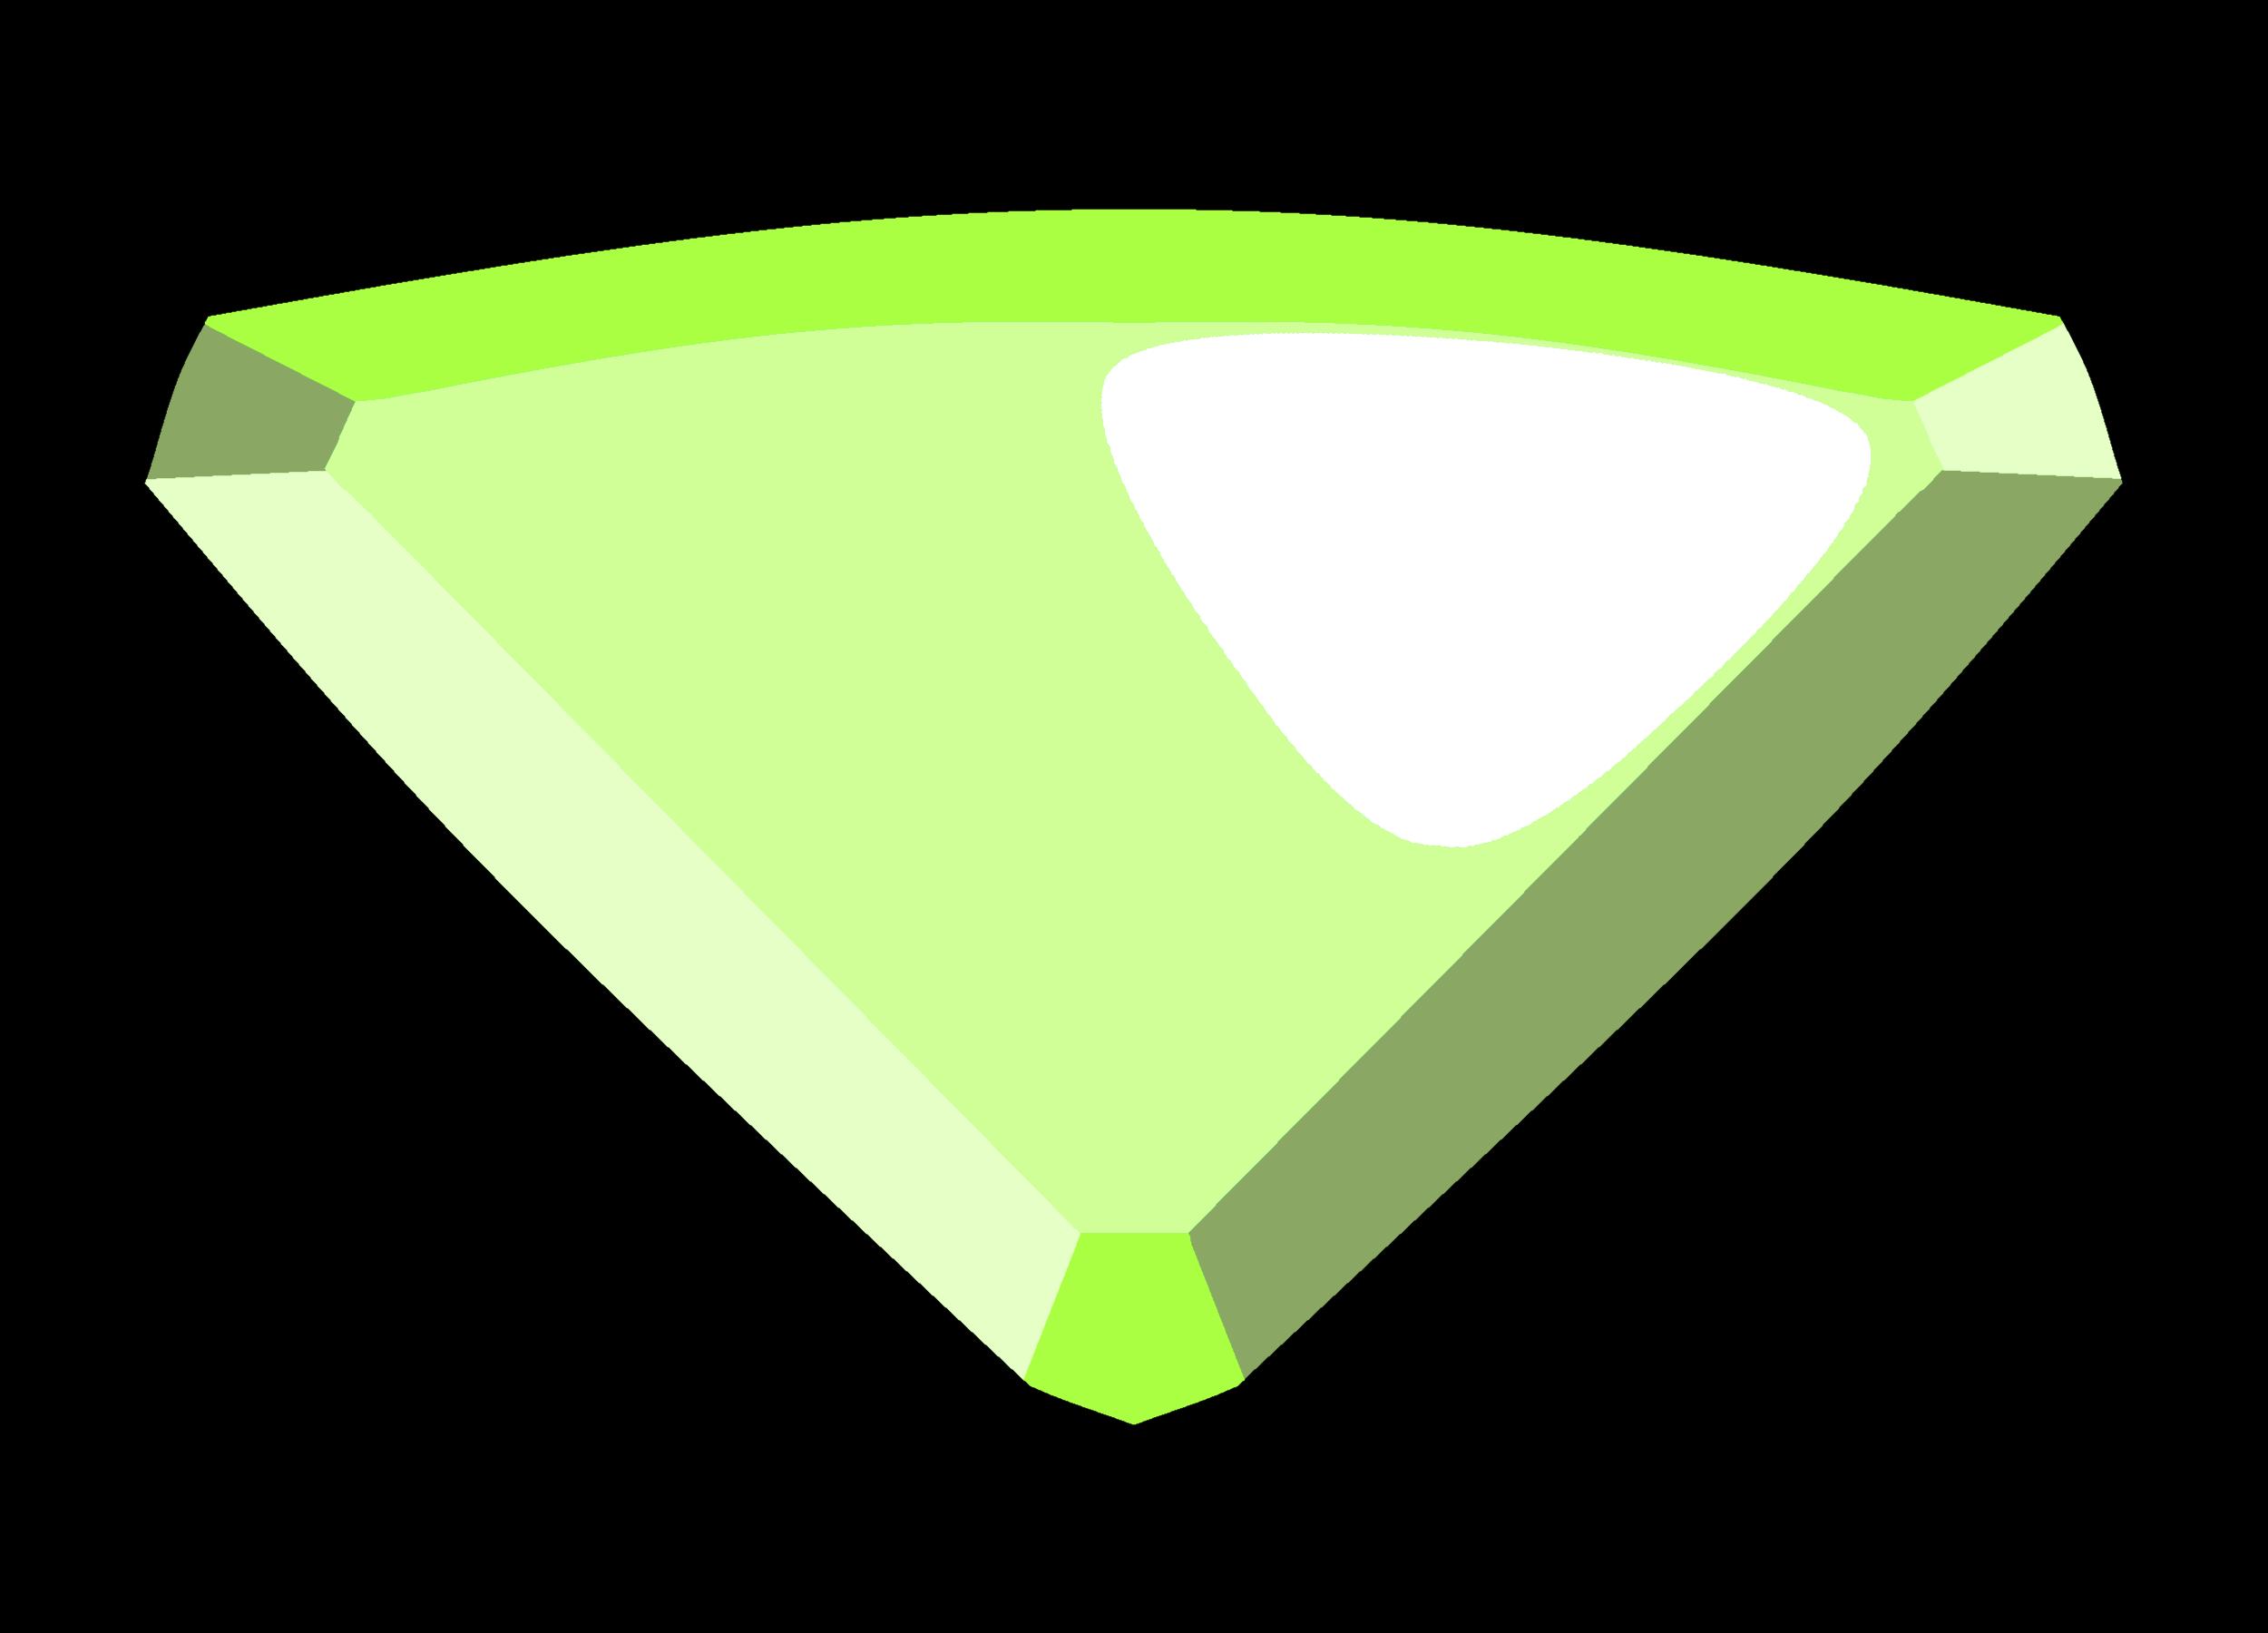 Gem clipart peridot. Image bowenite gemstone png